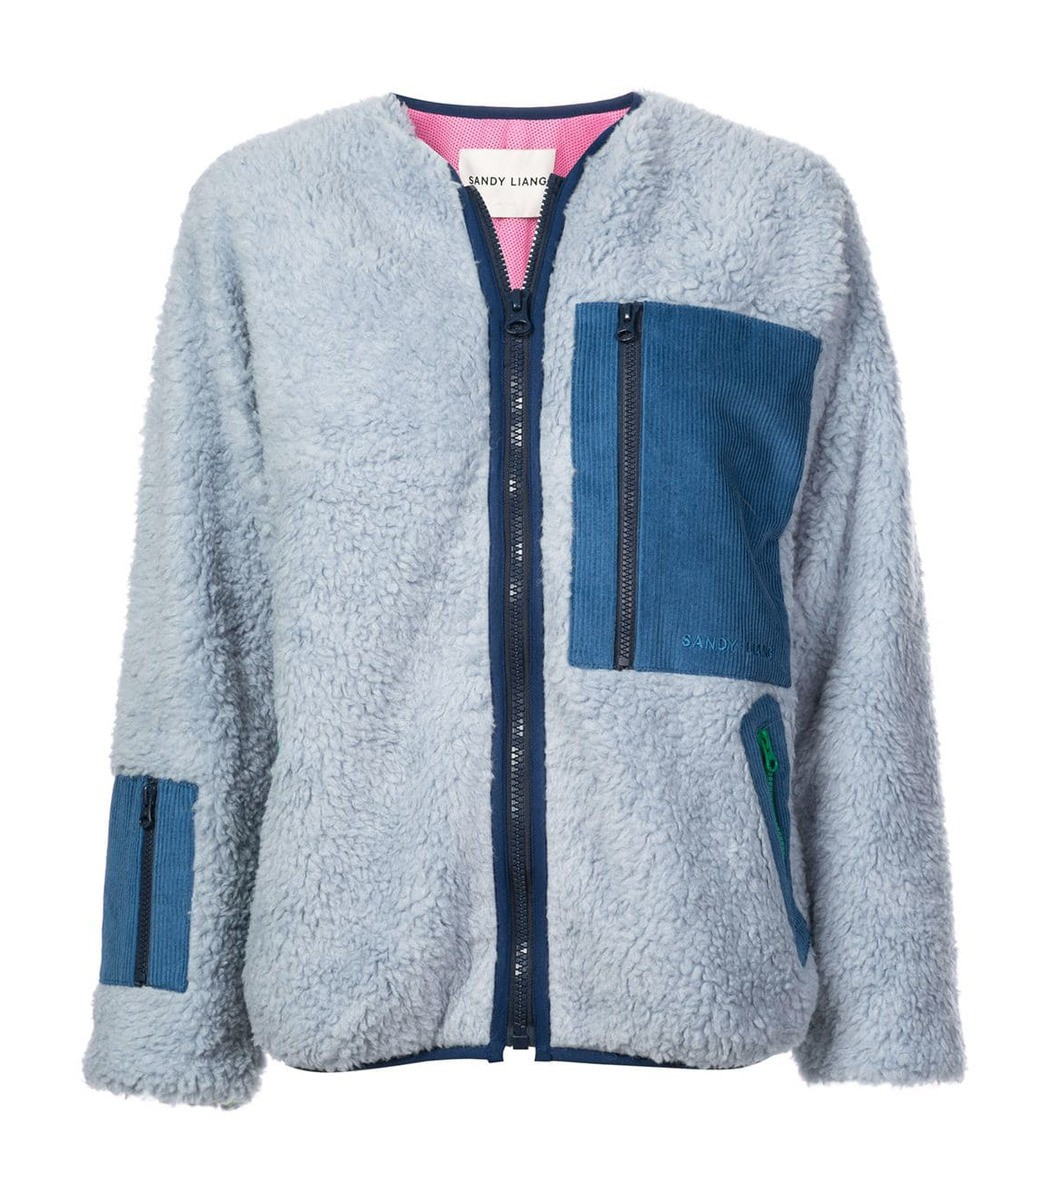 Sandy Liang Light Blue Fleece Patch Jacket